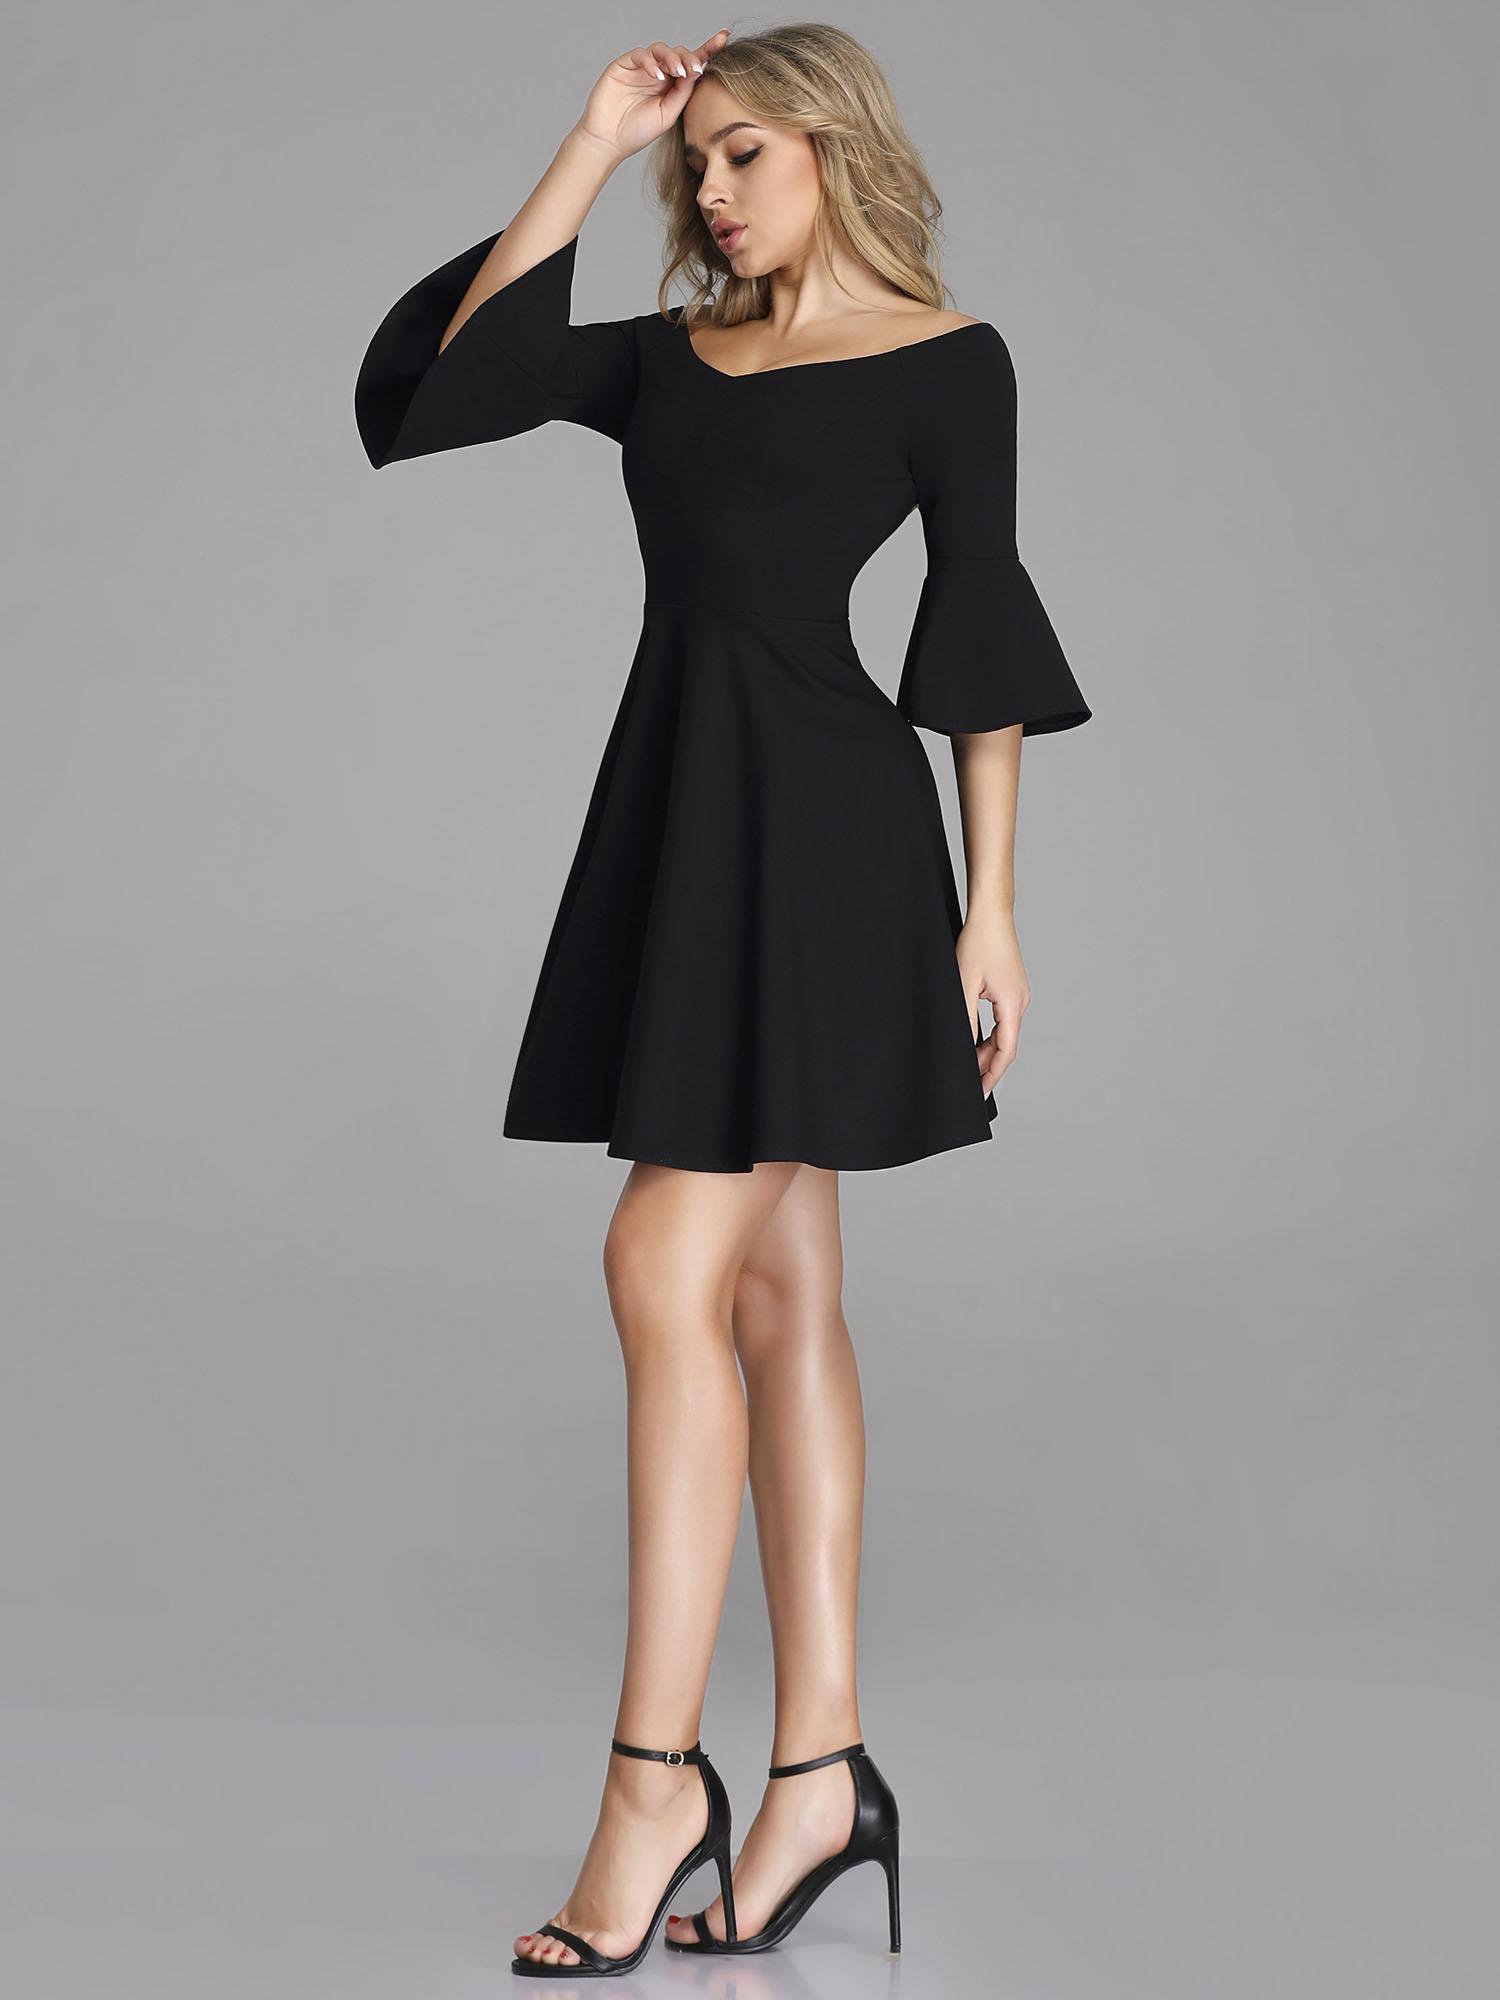 Ever-Pretty Short A Line Wedding Dresses Off Shoulder Black Evening ...